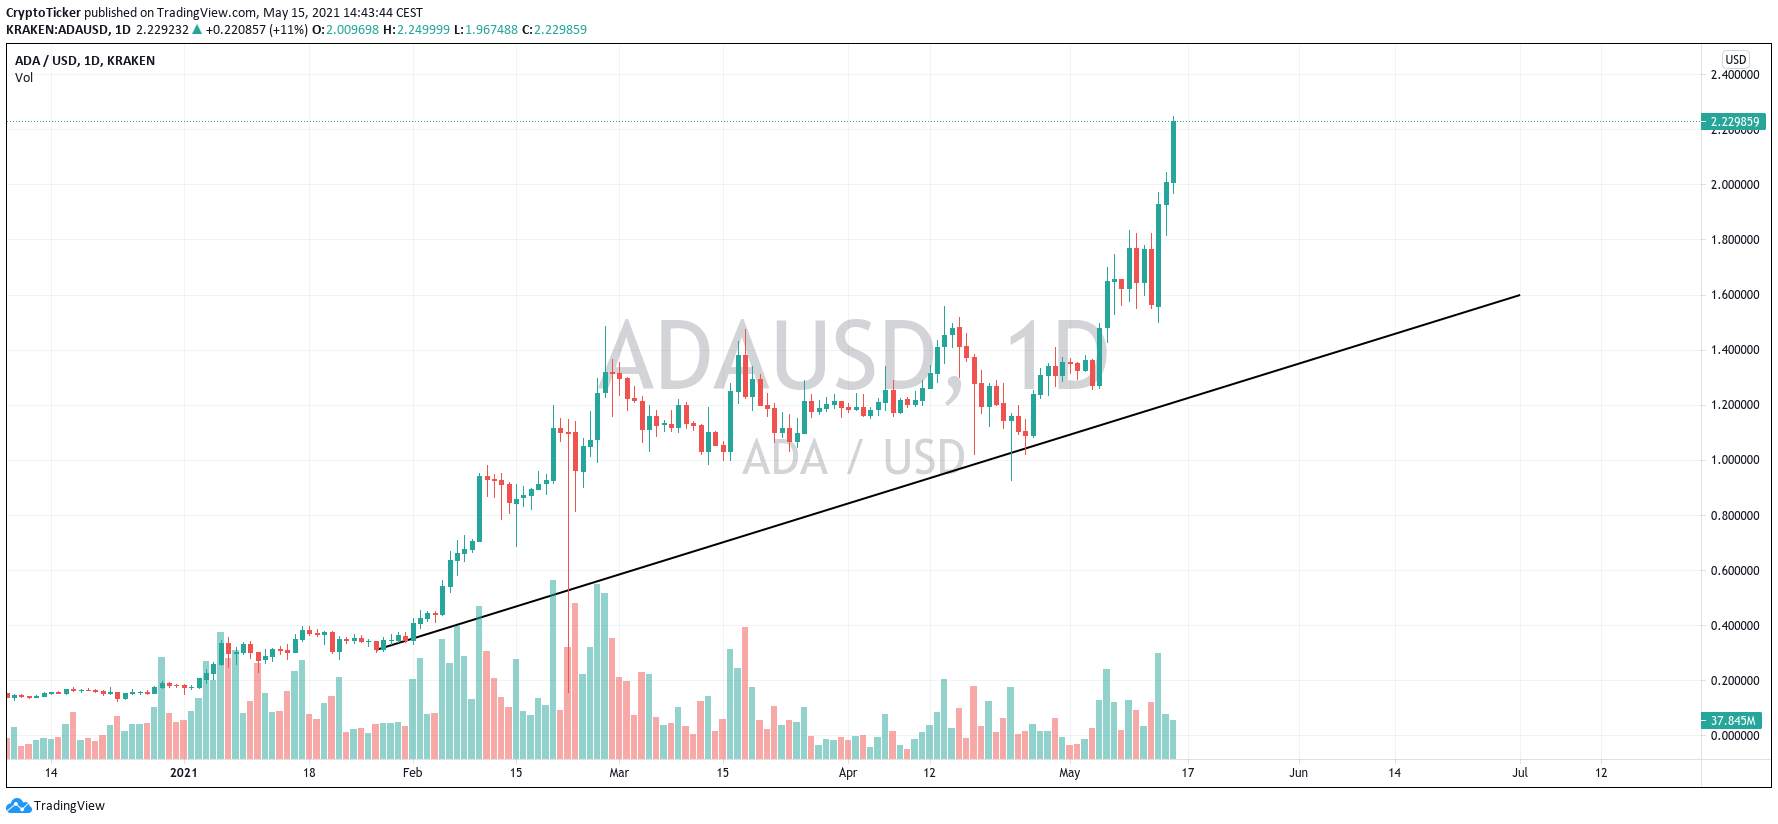 altcoin boom: ADA/USD 1-day chart